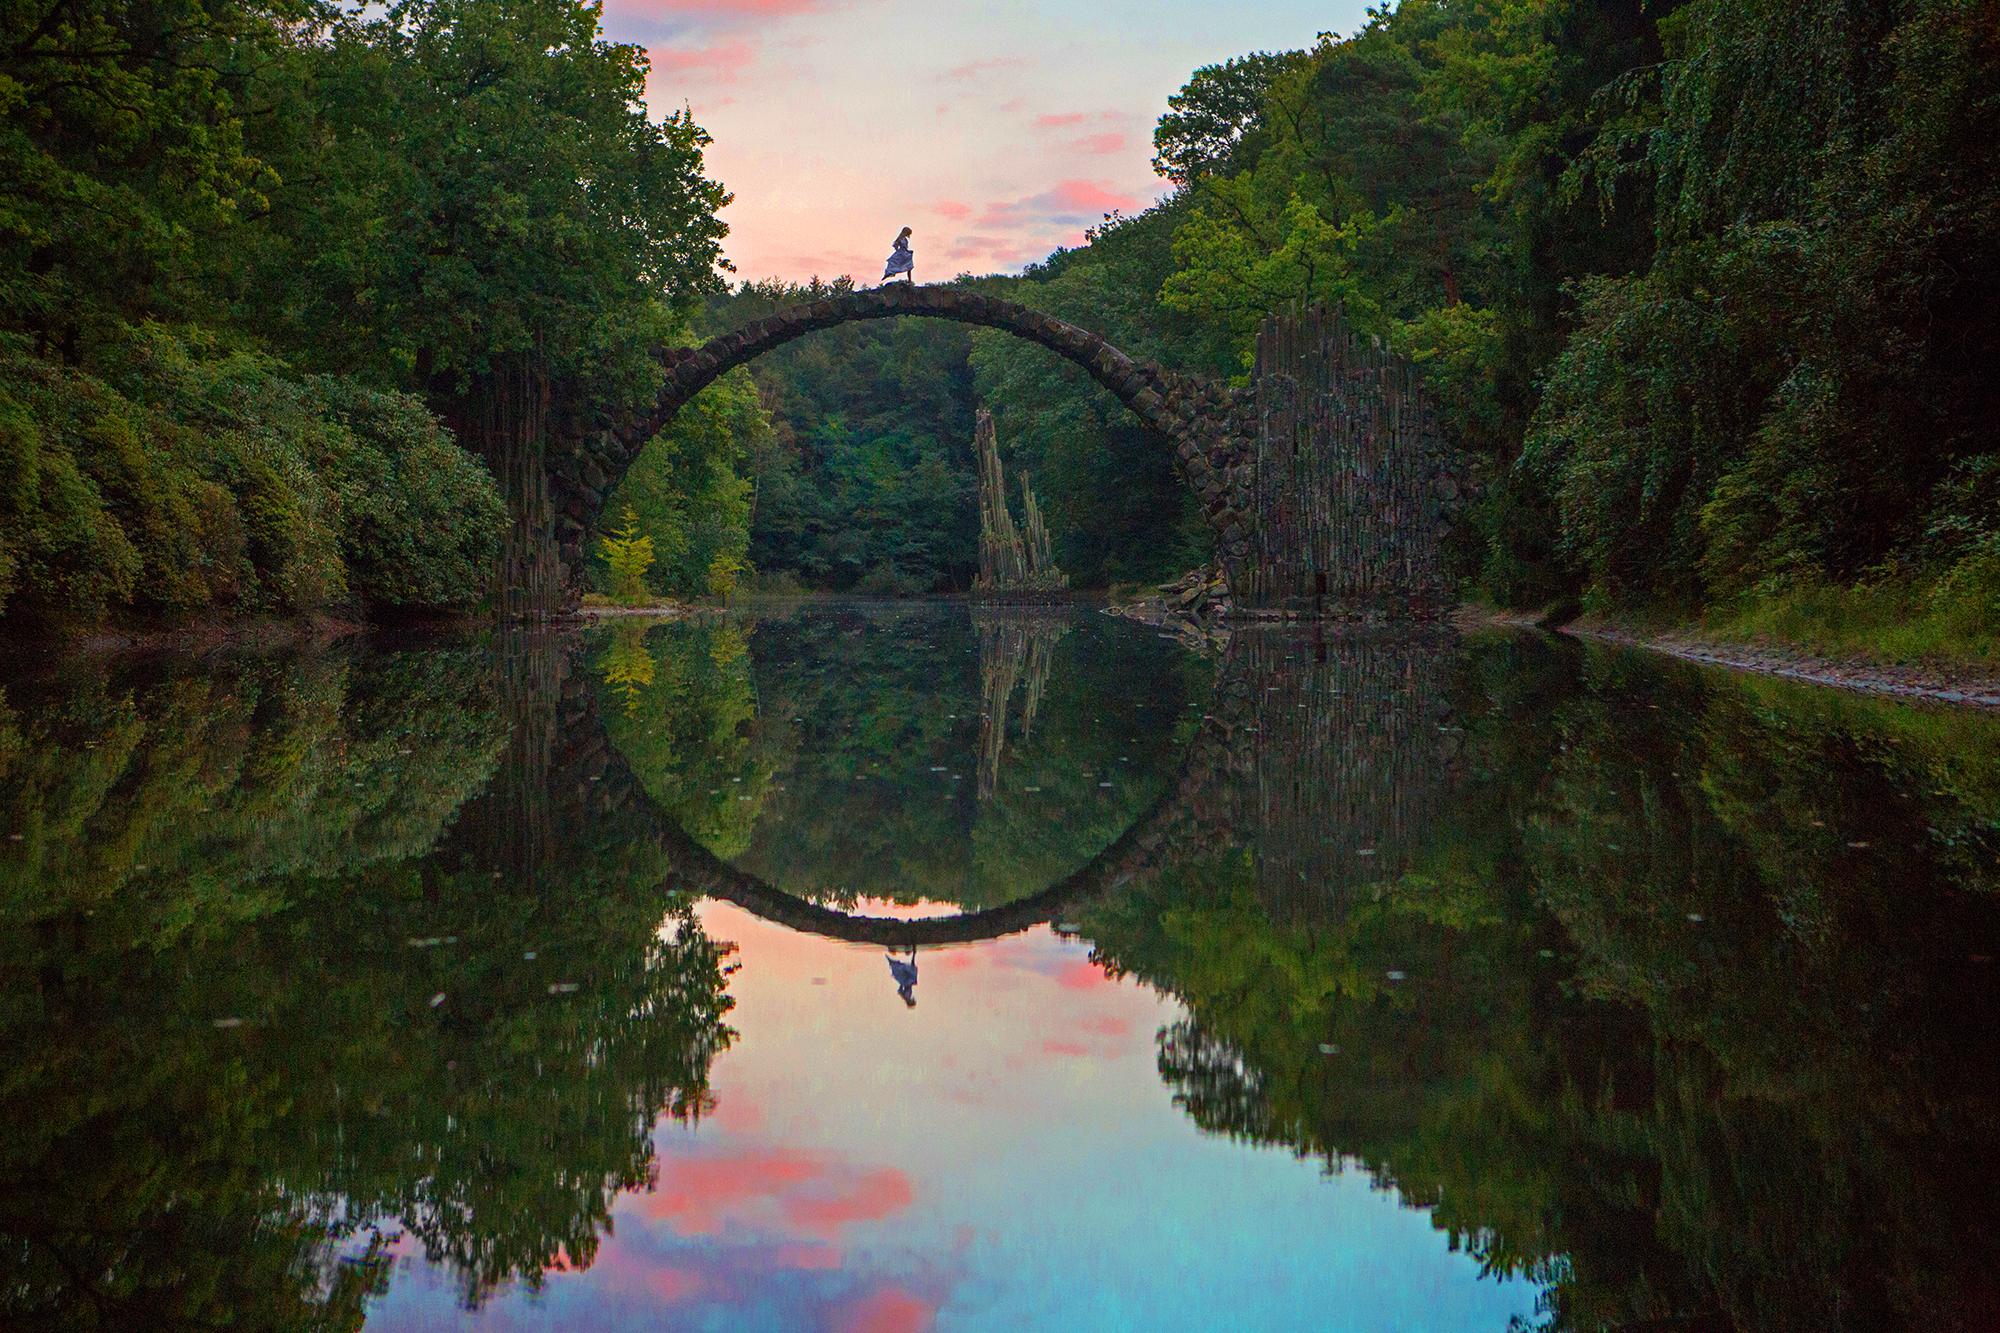 AstroBandit_DariusTwin_Proposal_Kromlau_Germany_Rakotzbrucke_Bridge_Reflection_Ring_WhiteDress_11.jpg